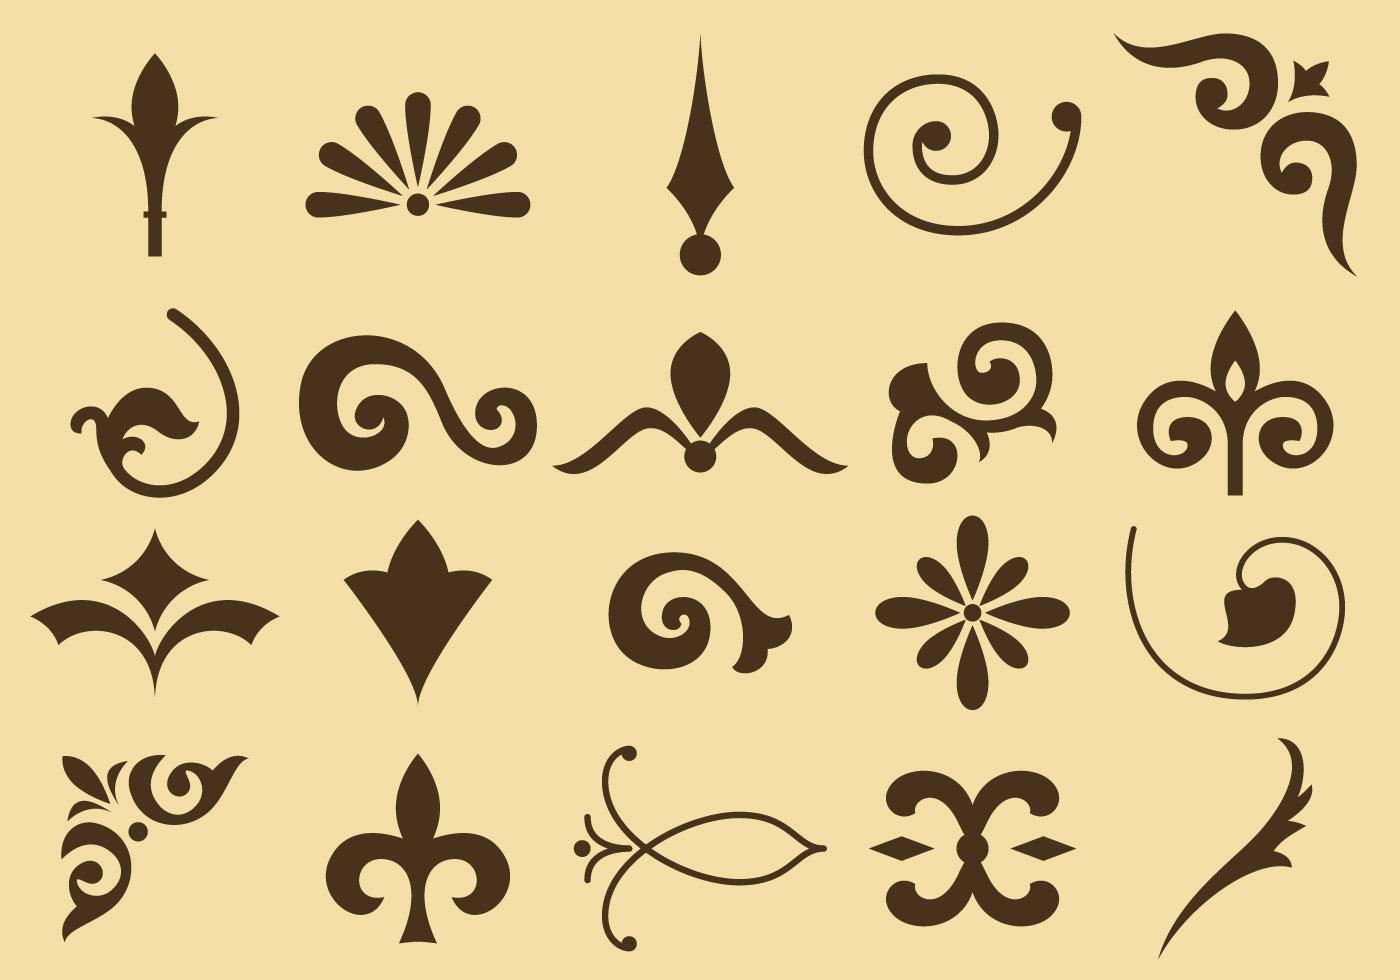 Flourish Vector Icons - Download Free Vector Art, Stock Graphics ...